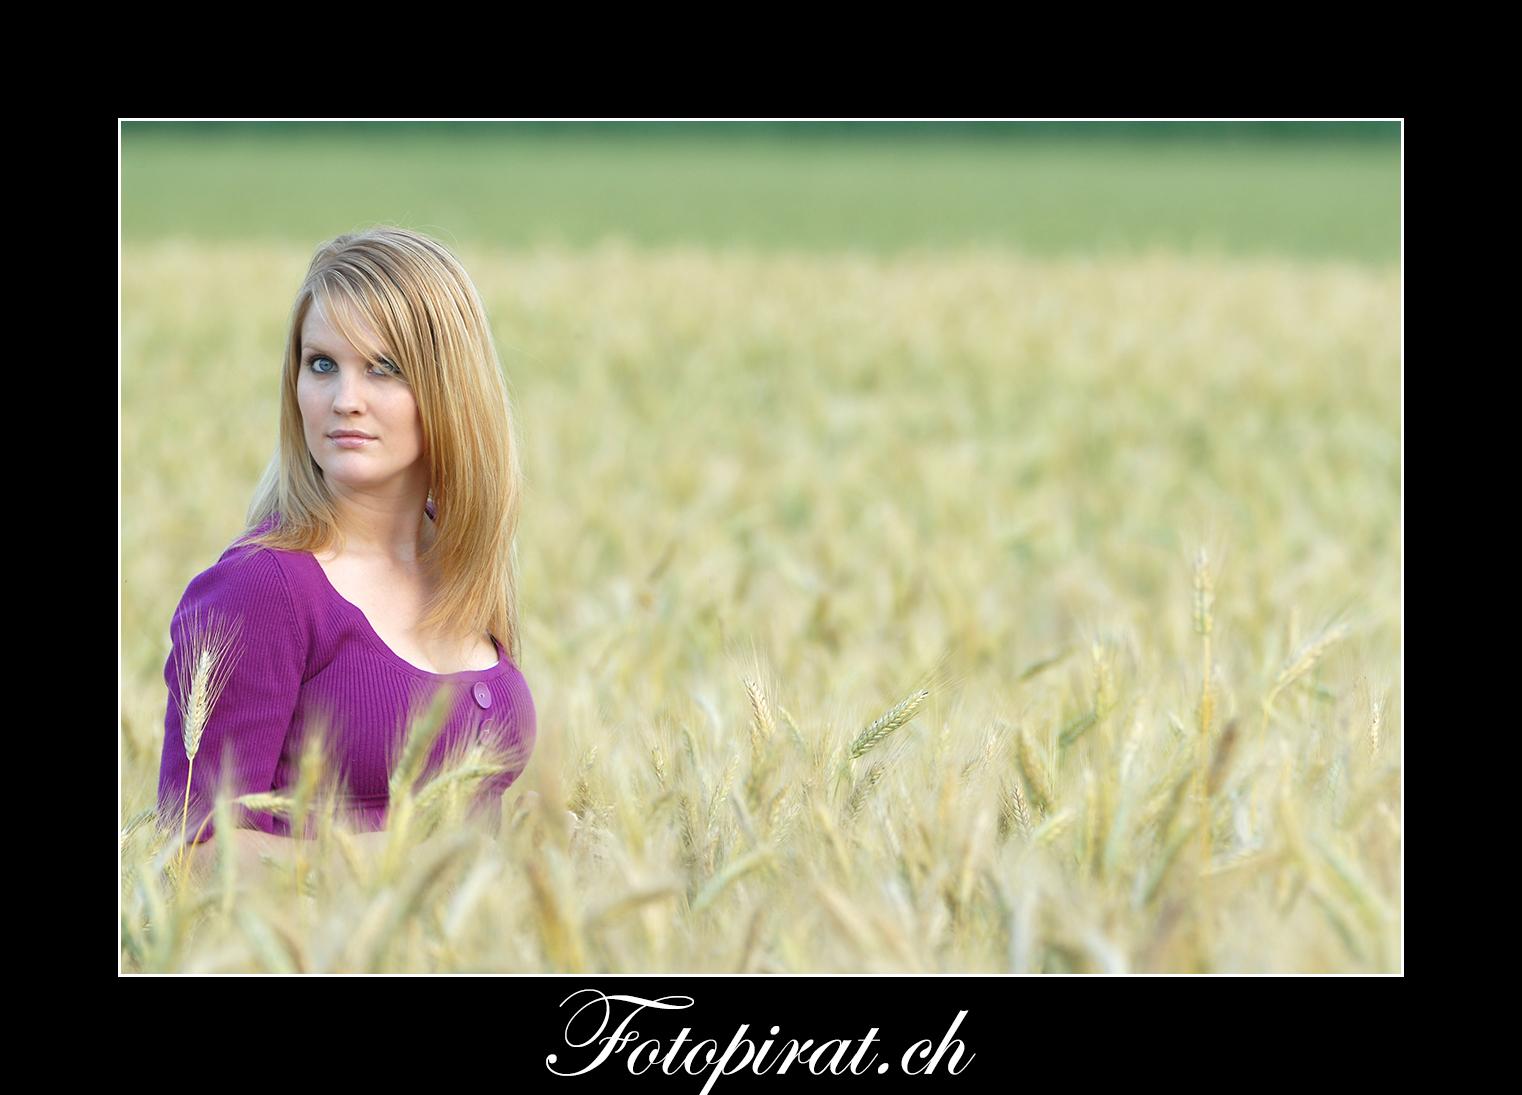 Fotoshooting, outdoor, Modelagentur, sexy Model, Fitnessmodel, Kornfeld, blondes Fotomodel